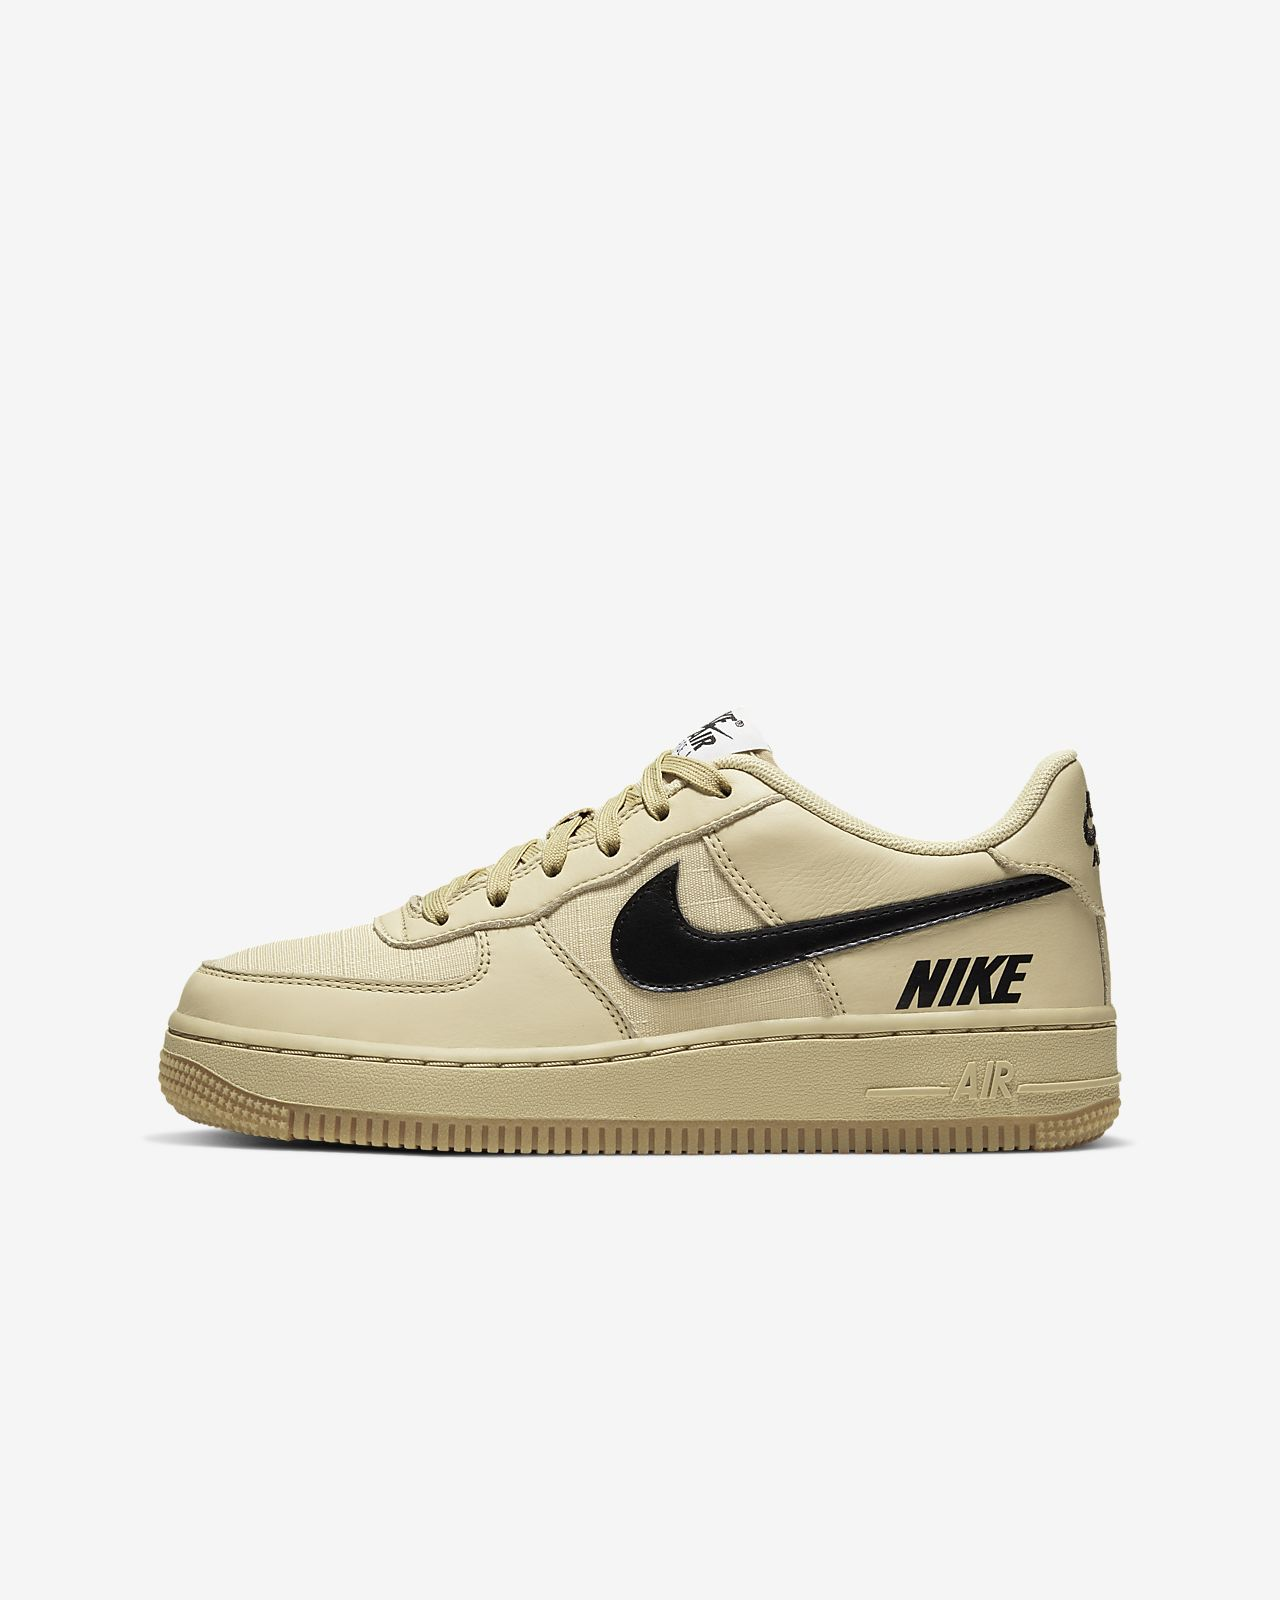 Buty dla dużych dzieci Nike Air Force 1 LV8 5